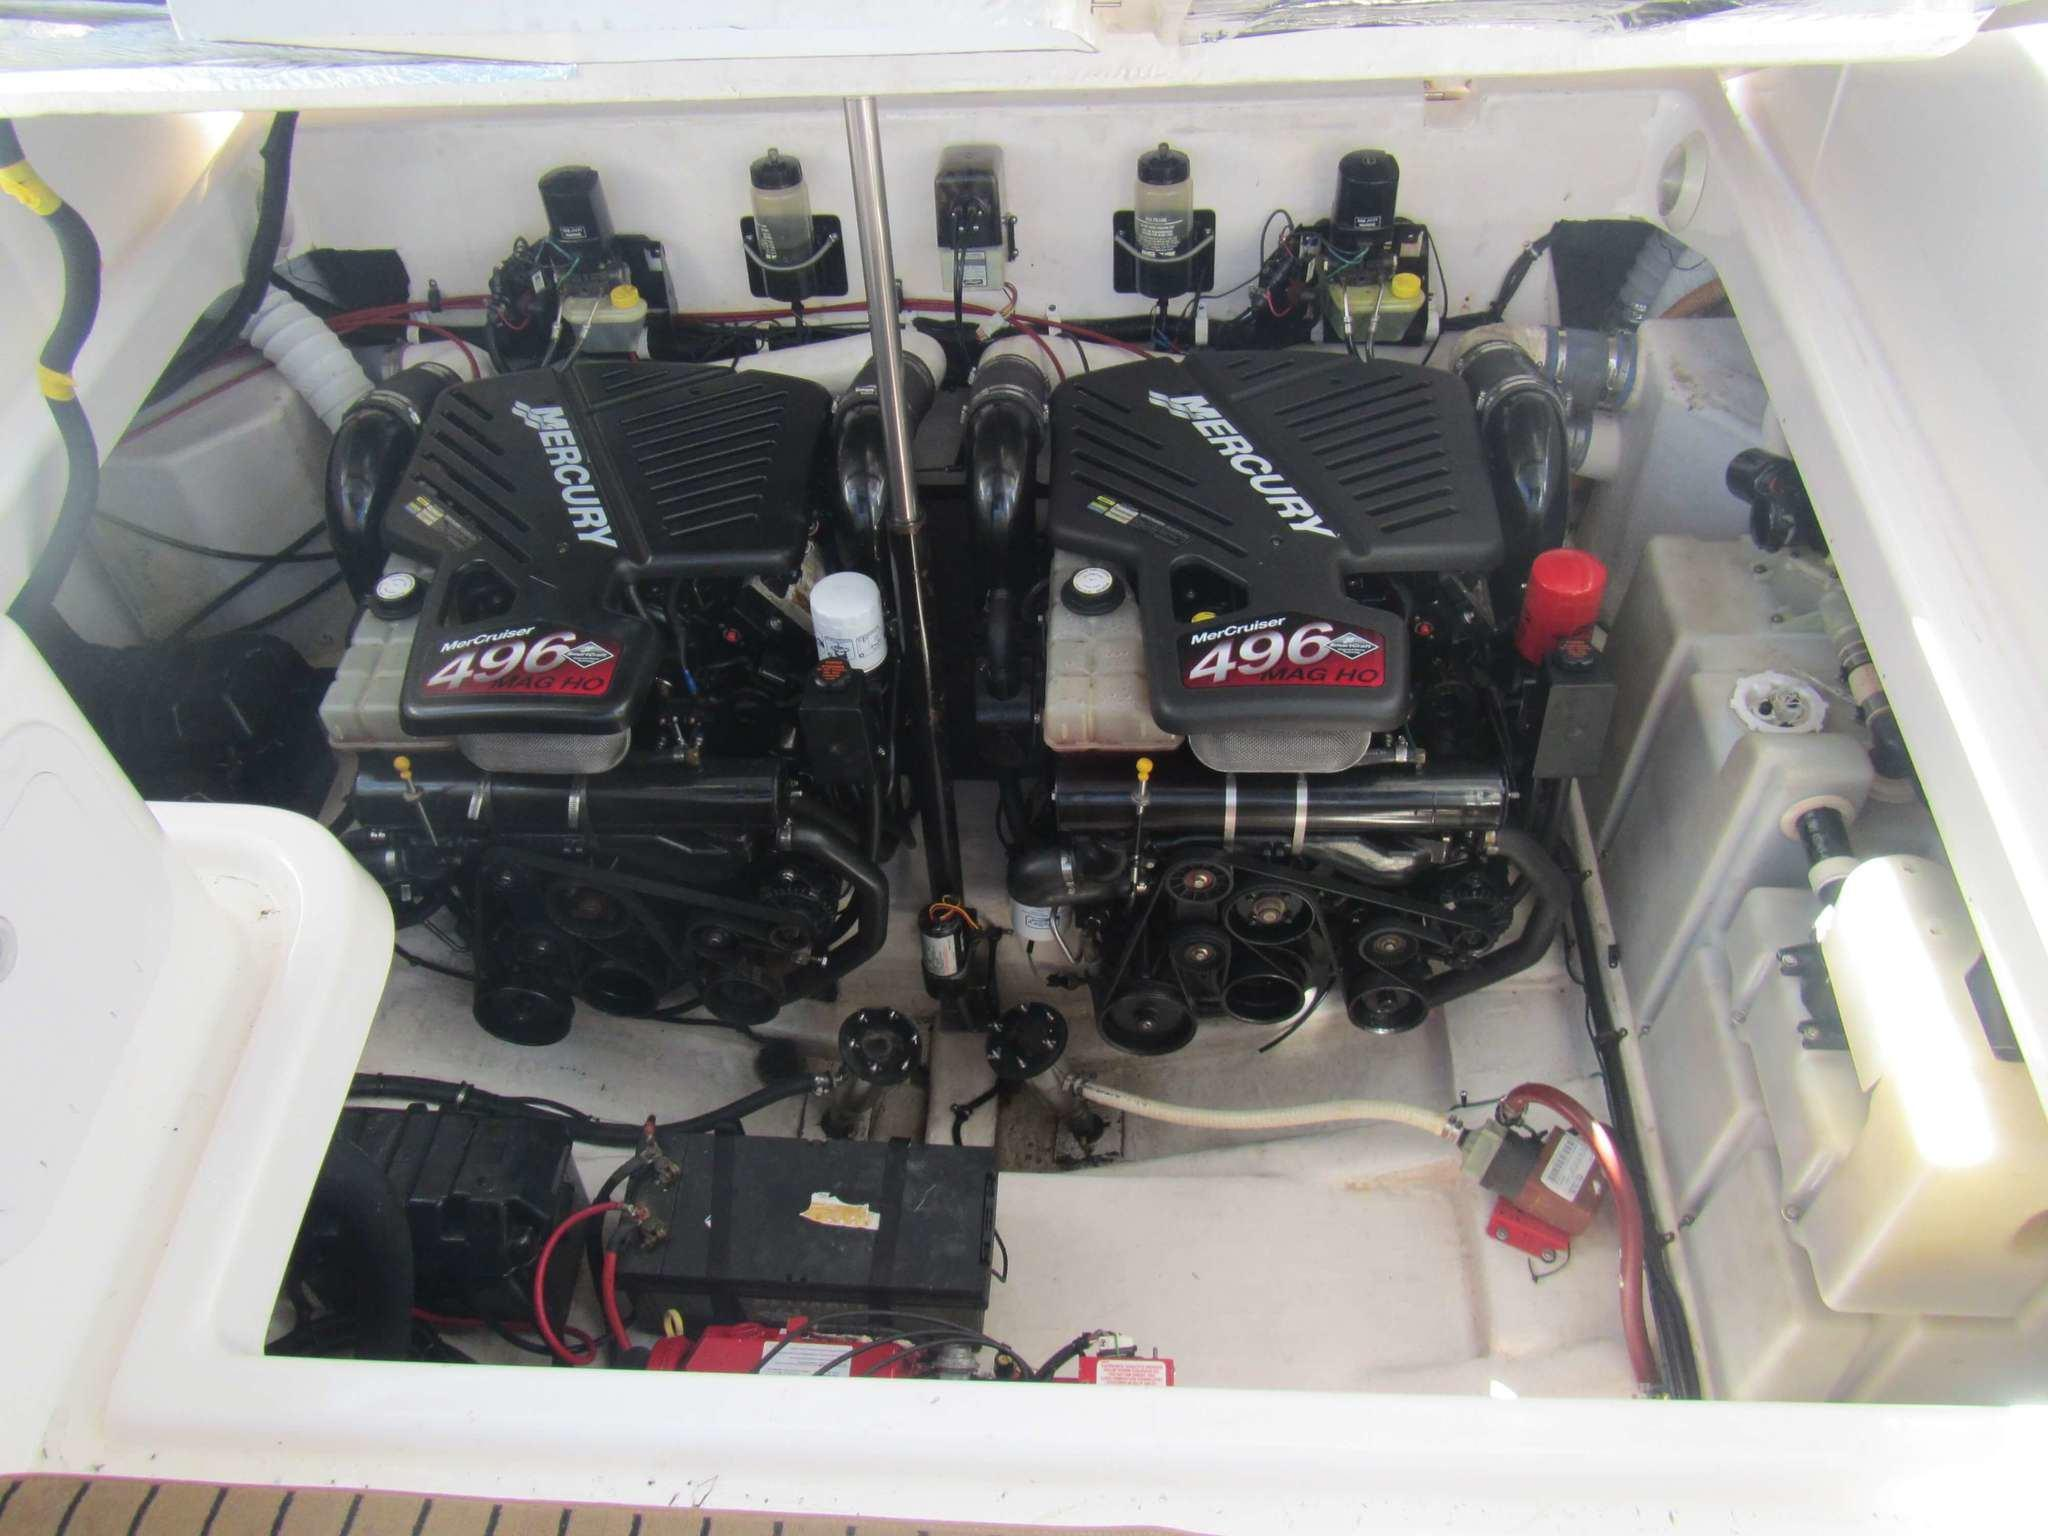 Riviera-M430-RM-028 UsedBoats